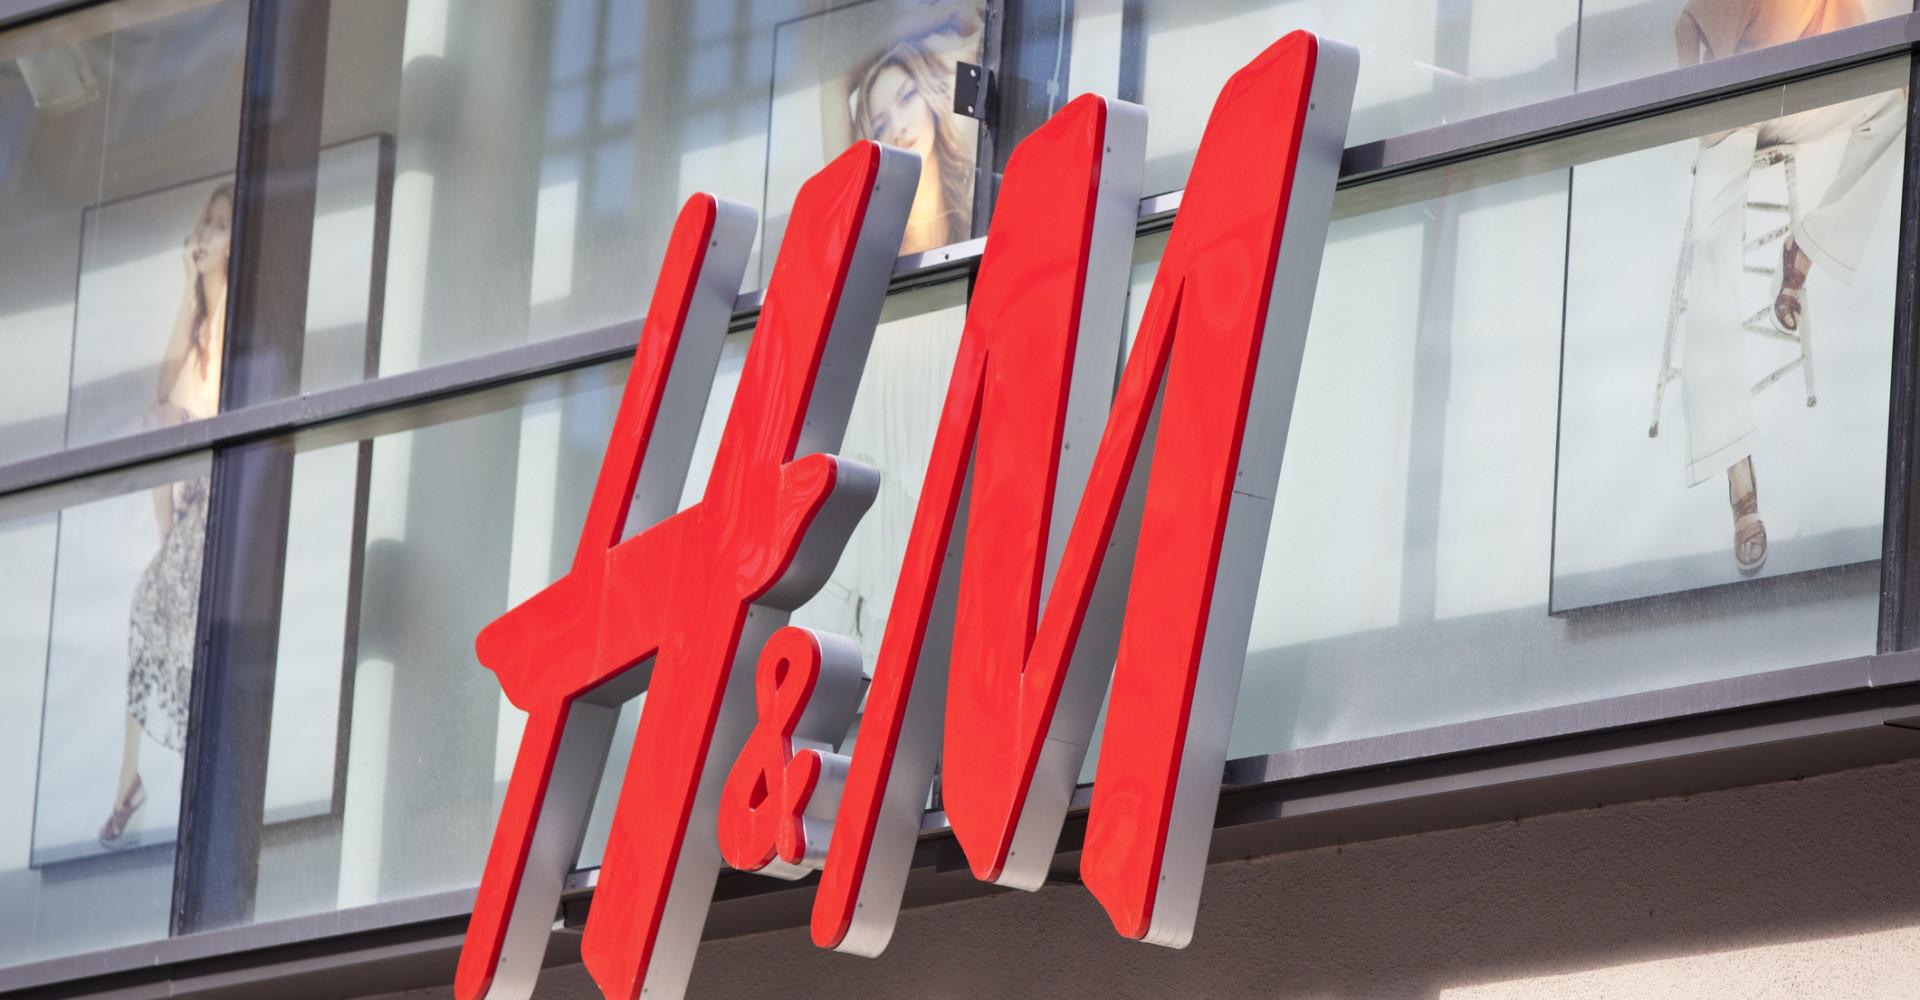 H&M withdrew the lawsuit against street artist Revok